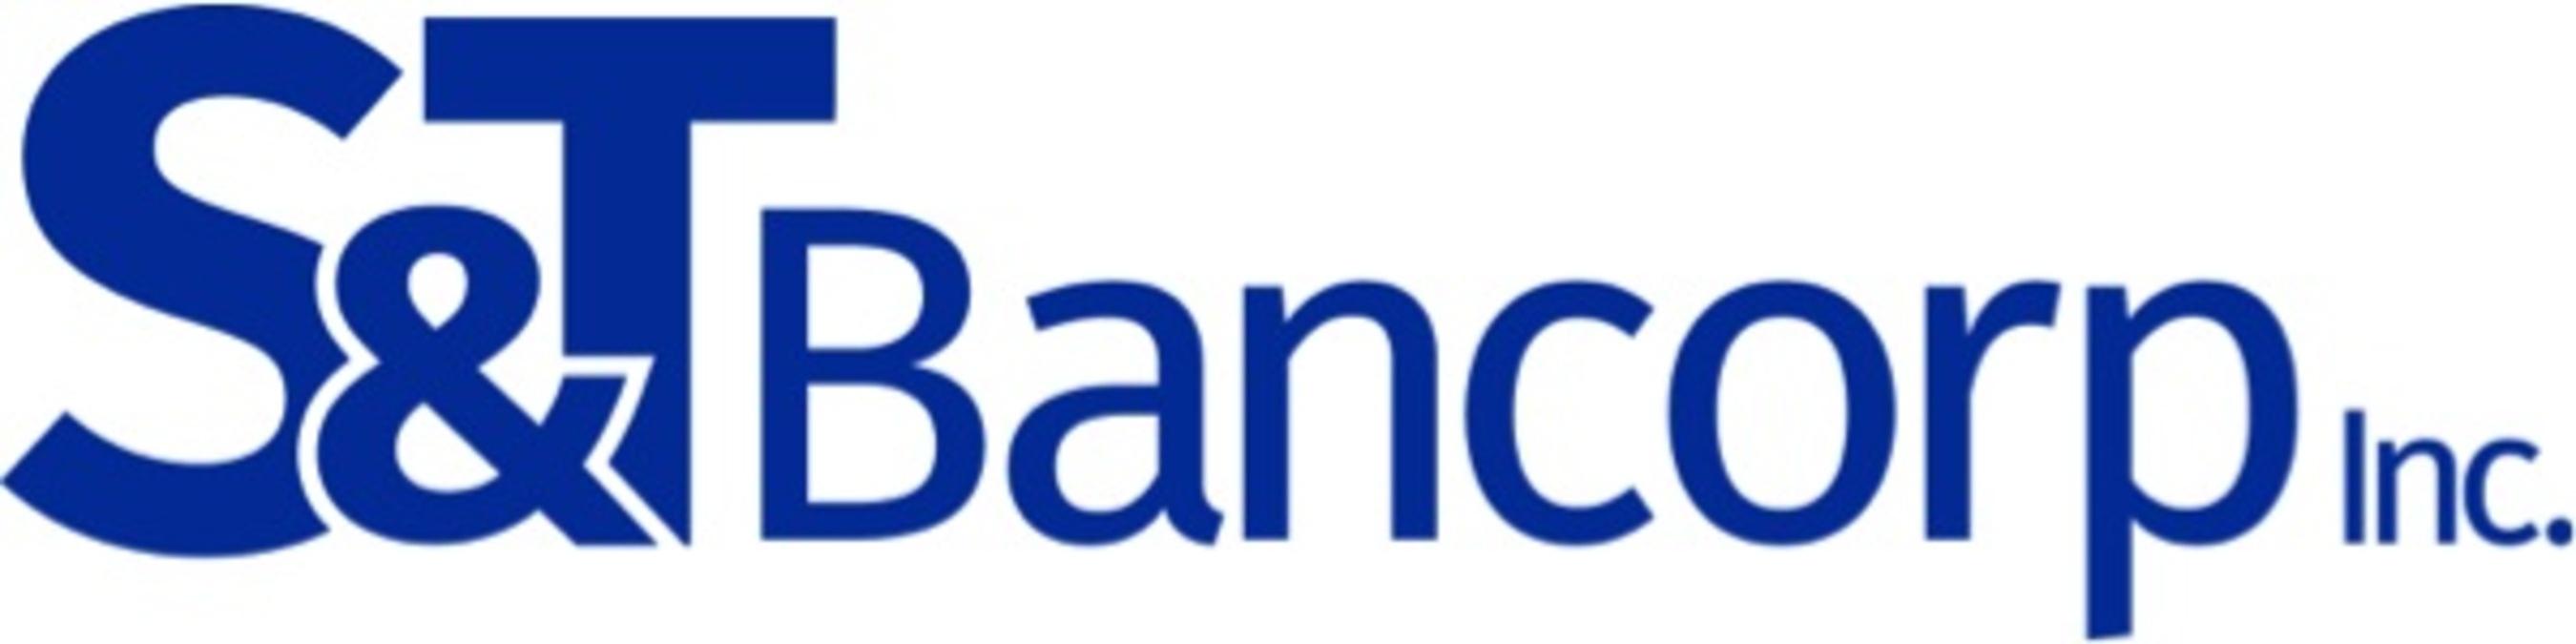 S&T Bancorp, Inc. Logo.